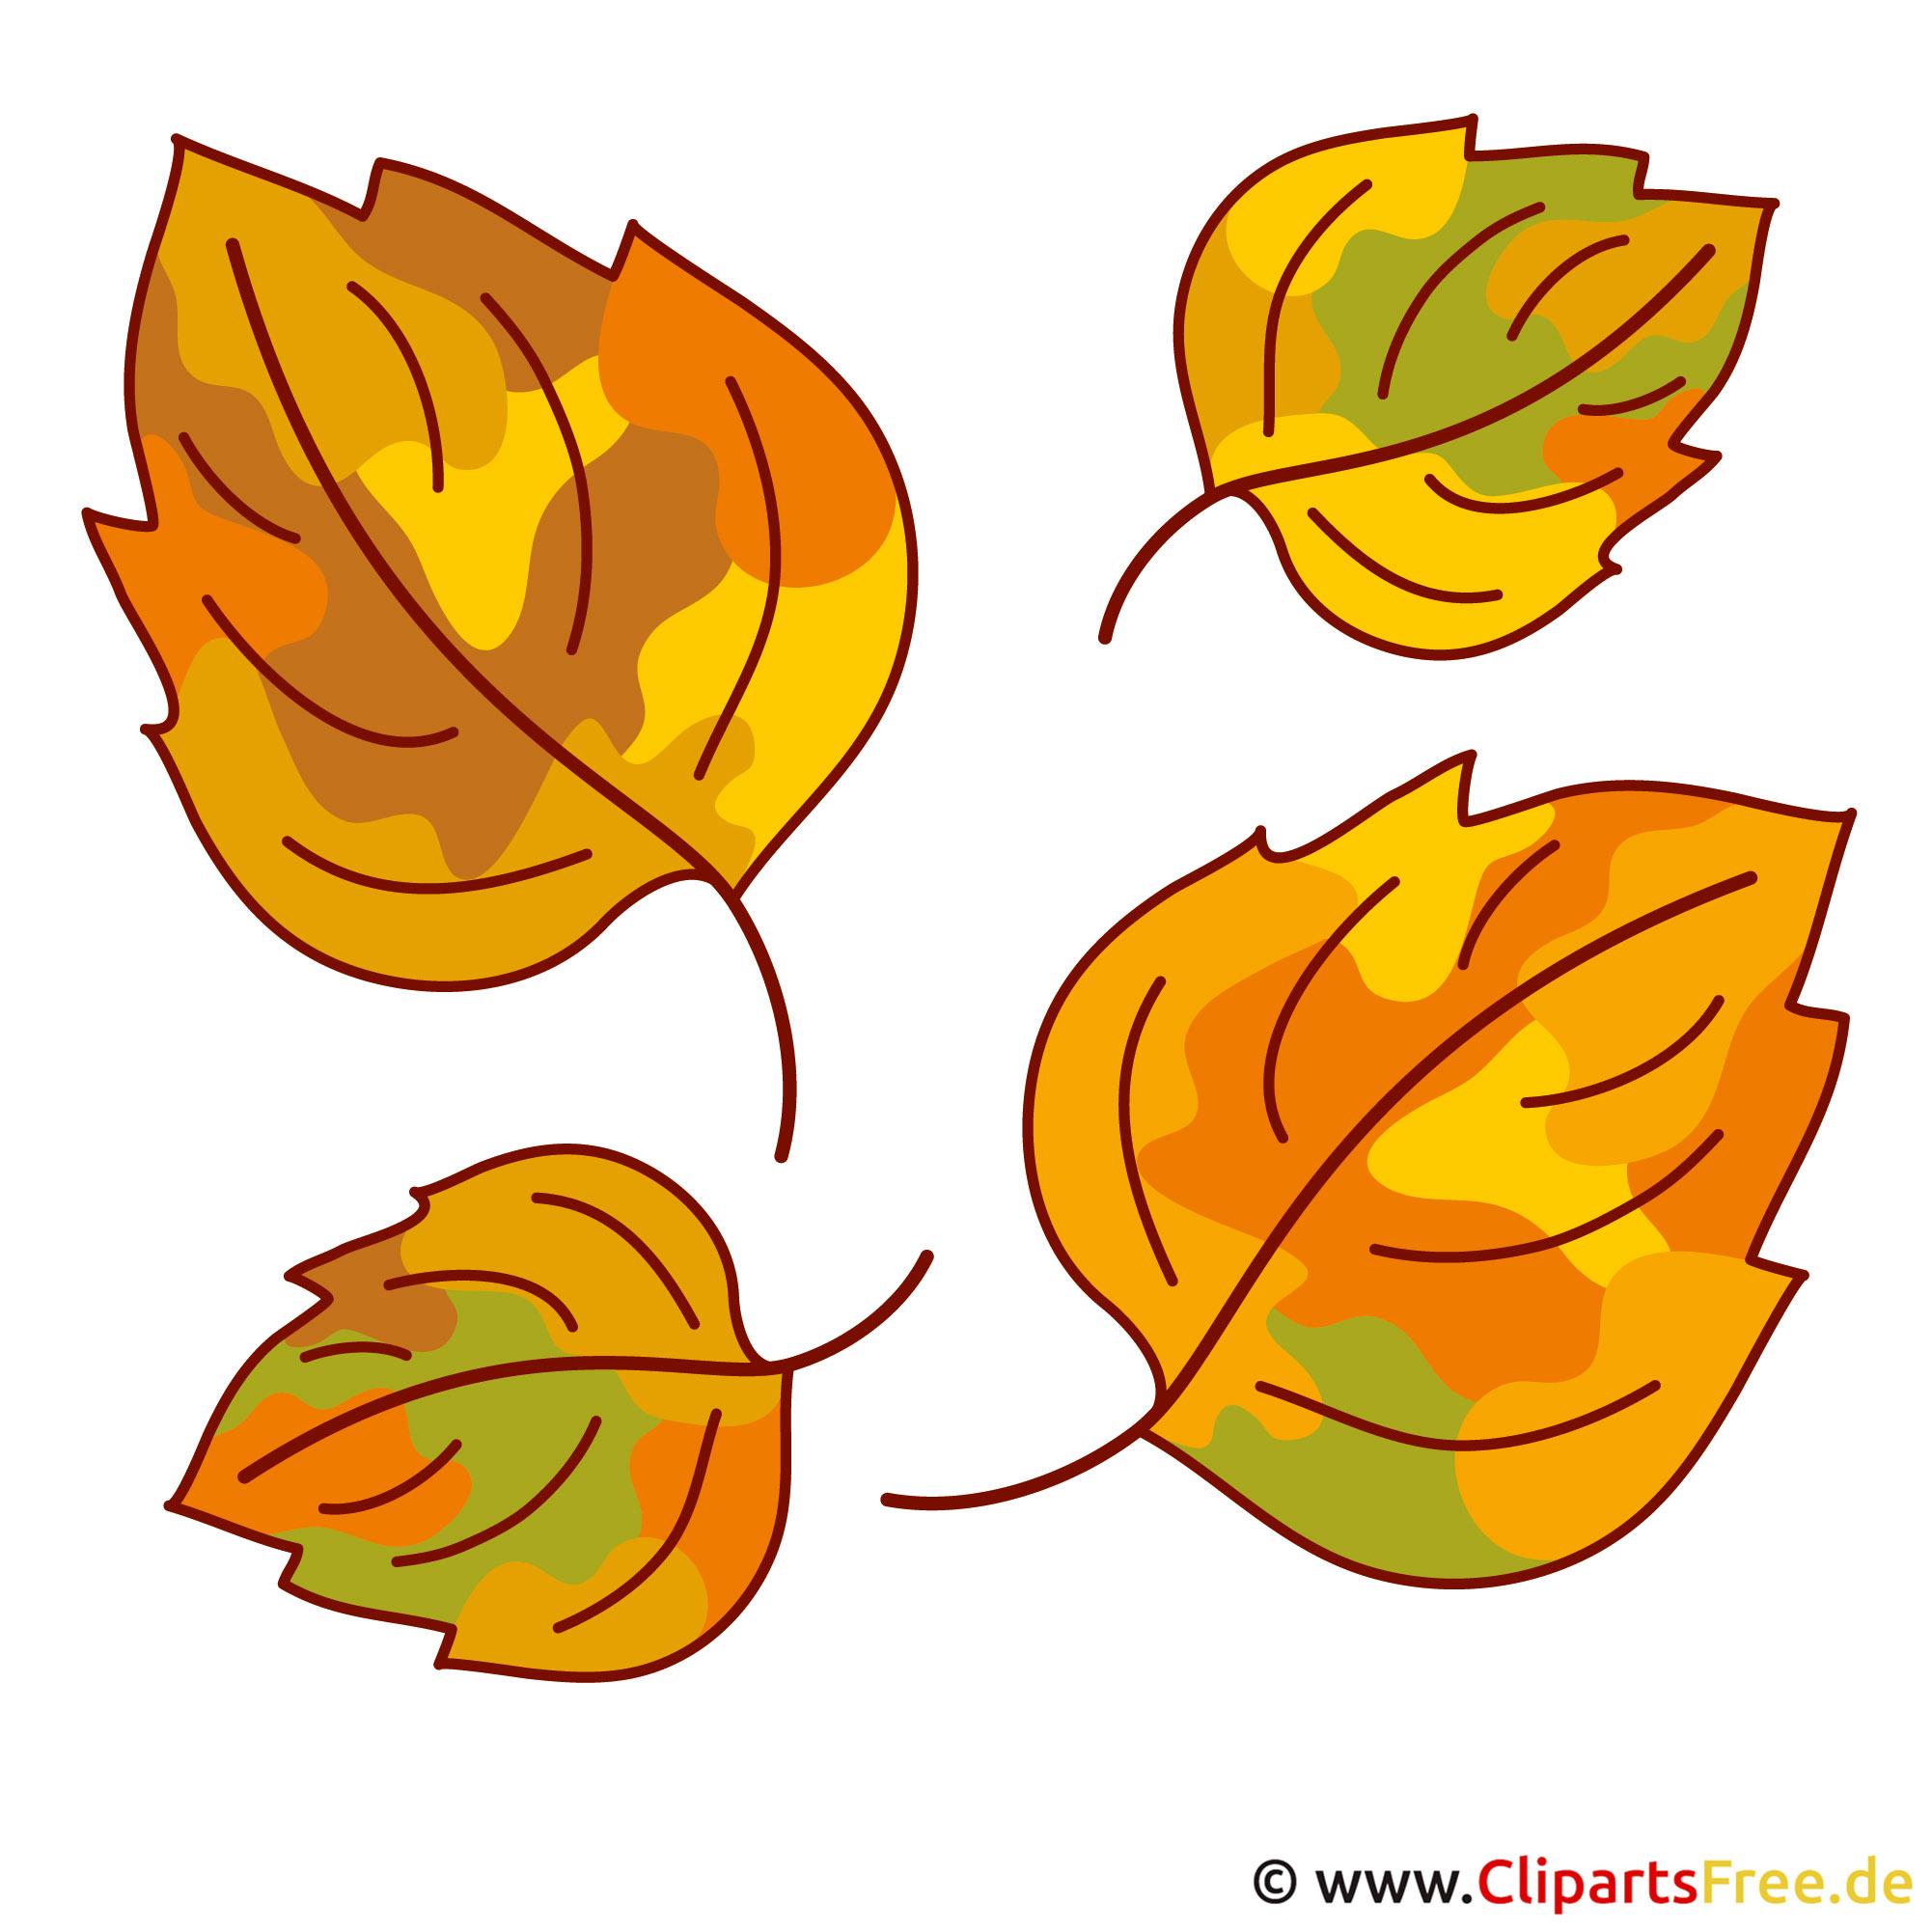 Free Falling Leaves Live Wallpaper Herbstliche Bilder Kostenlos Herbst Bume Natur With